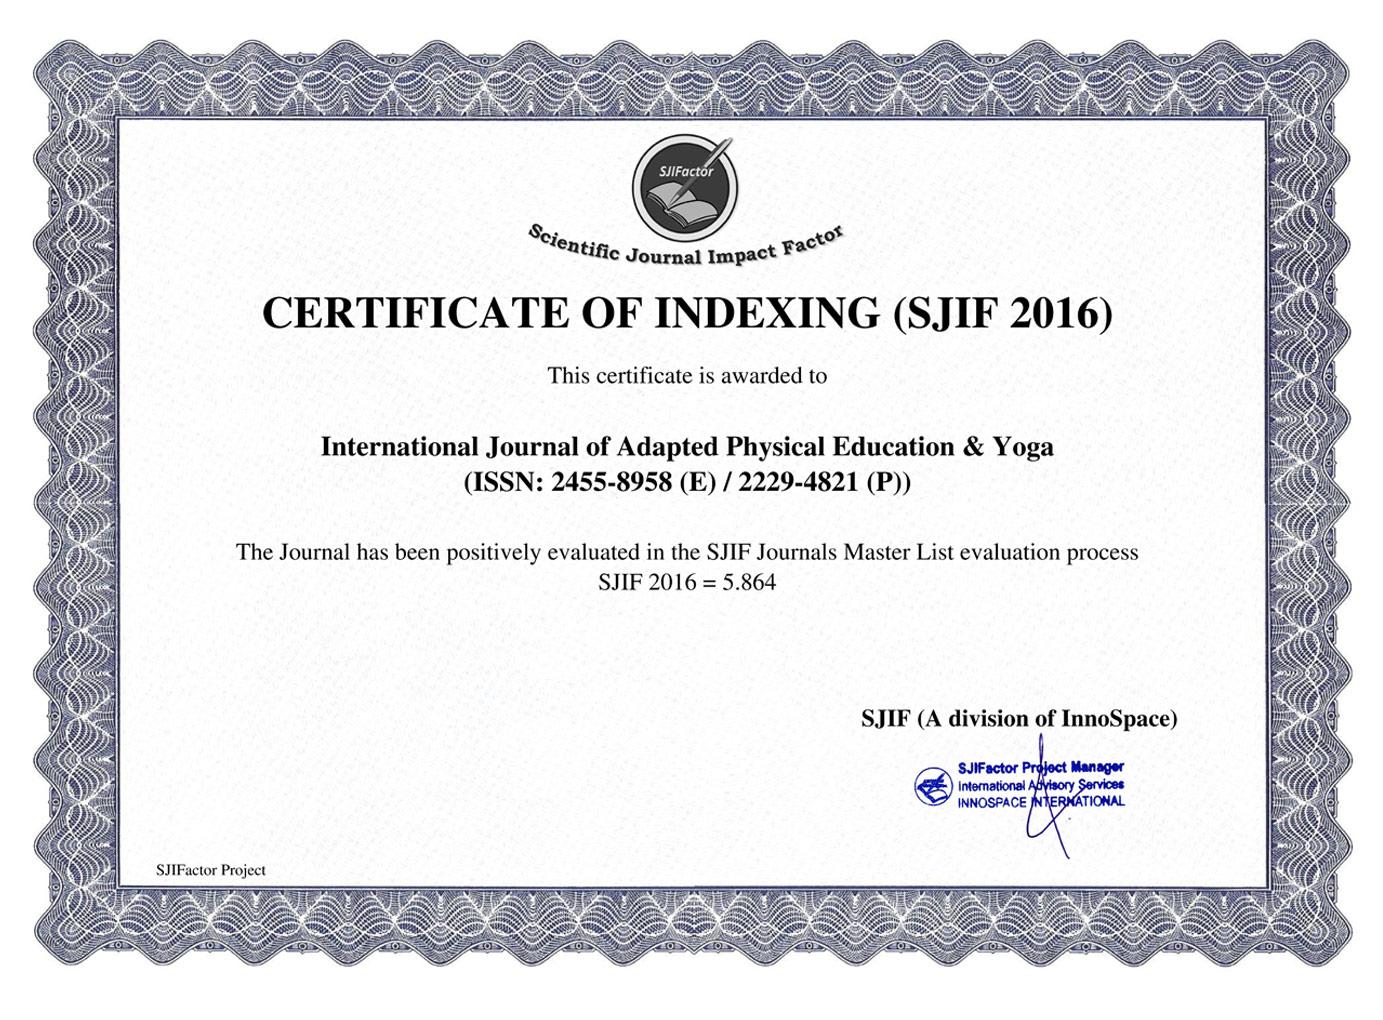 Impact factor Certificate | IJAPEY, Online Journal || International